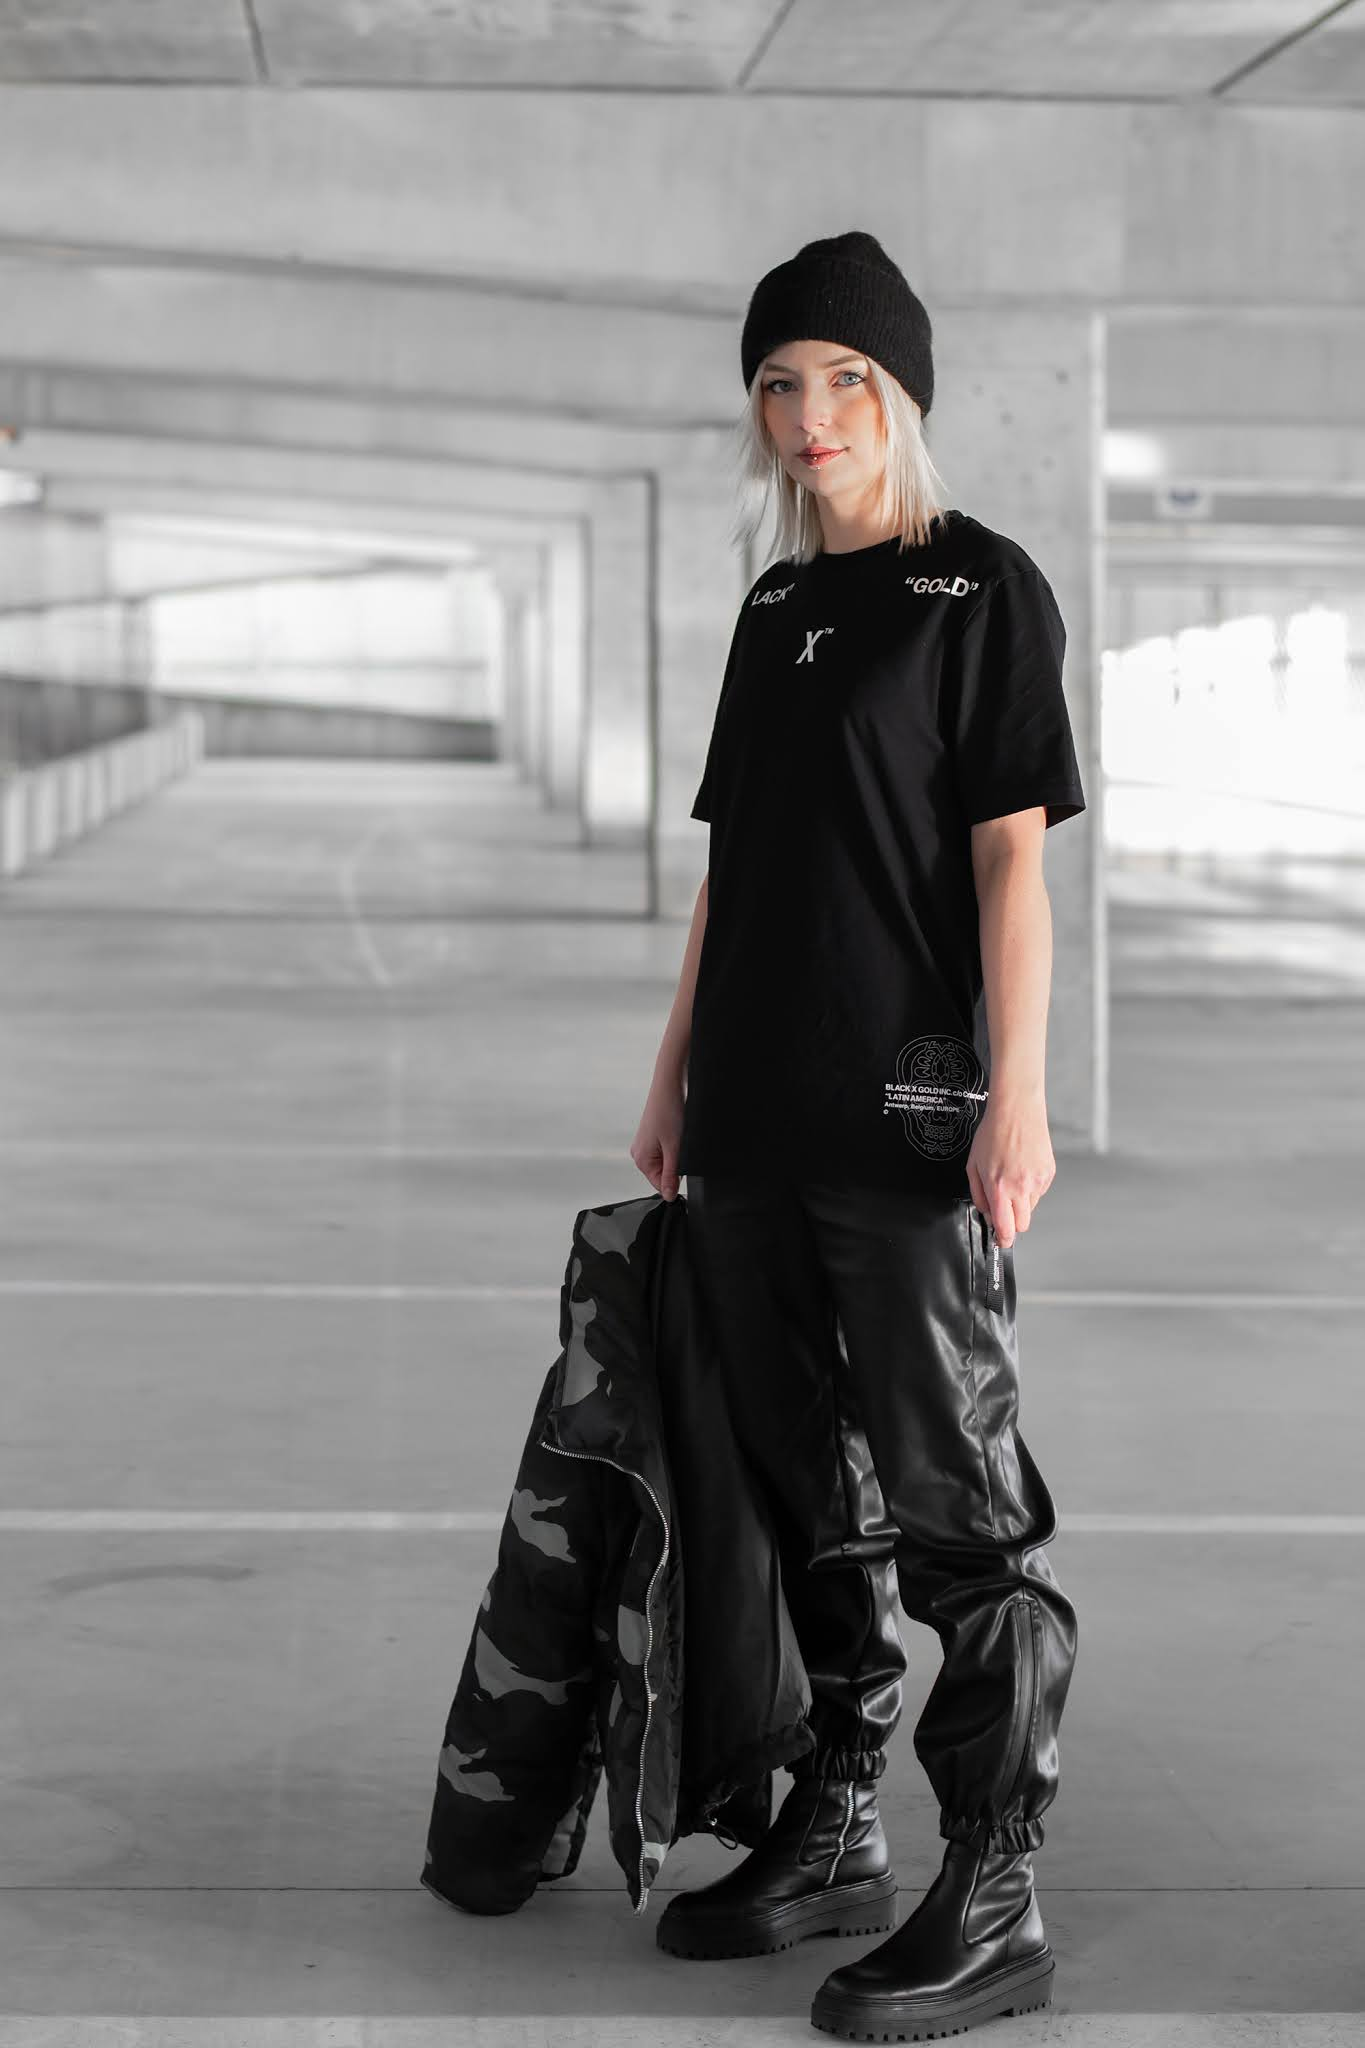 Black & gold, official, utility collection, street style, belgium, ik koop belgisch, belgian brand, streetwear, 2021, leather trousers